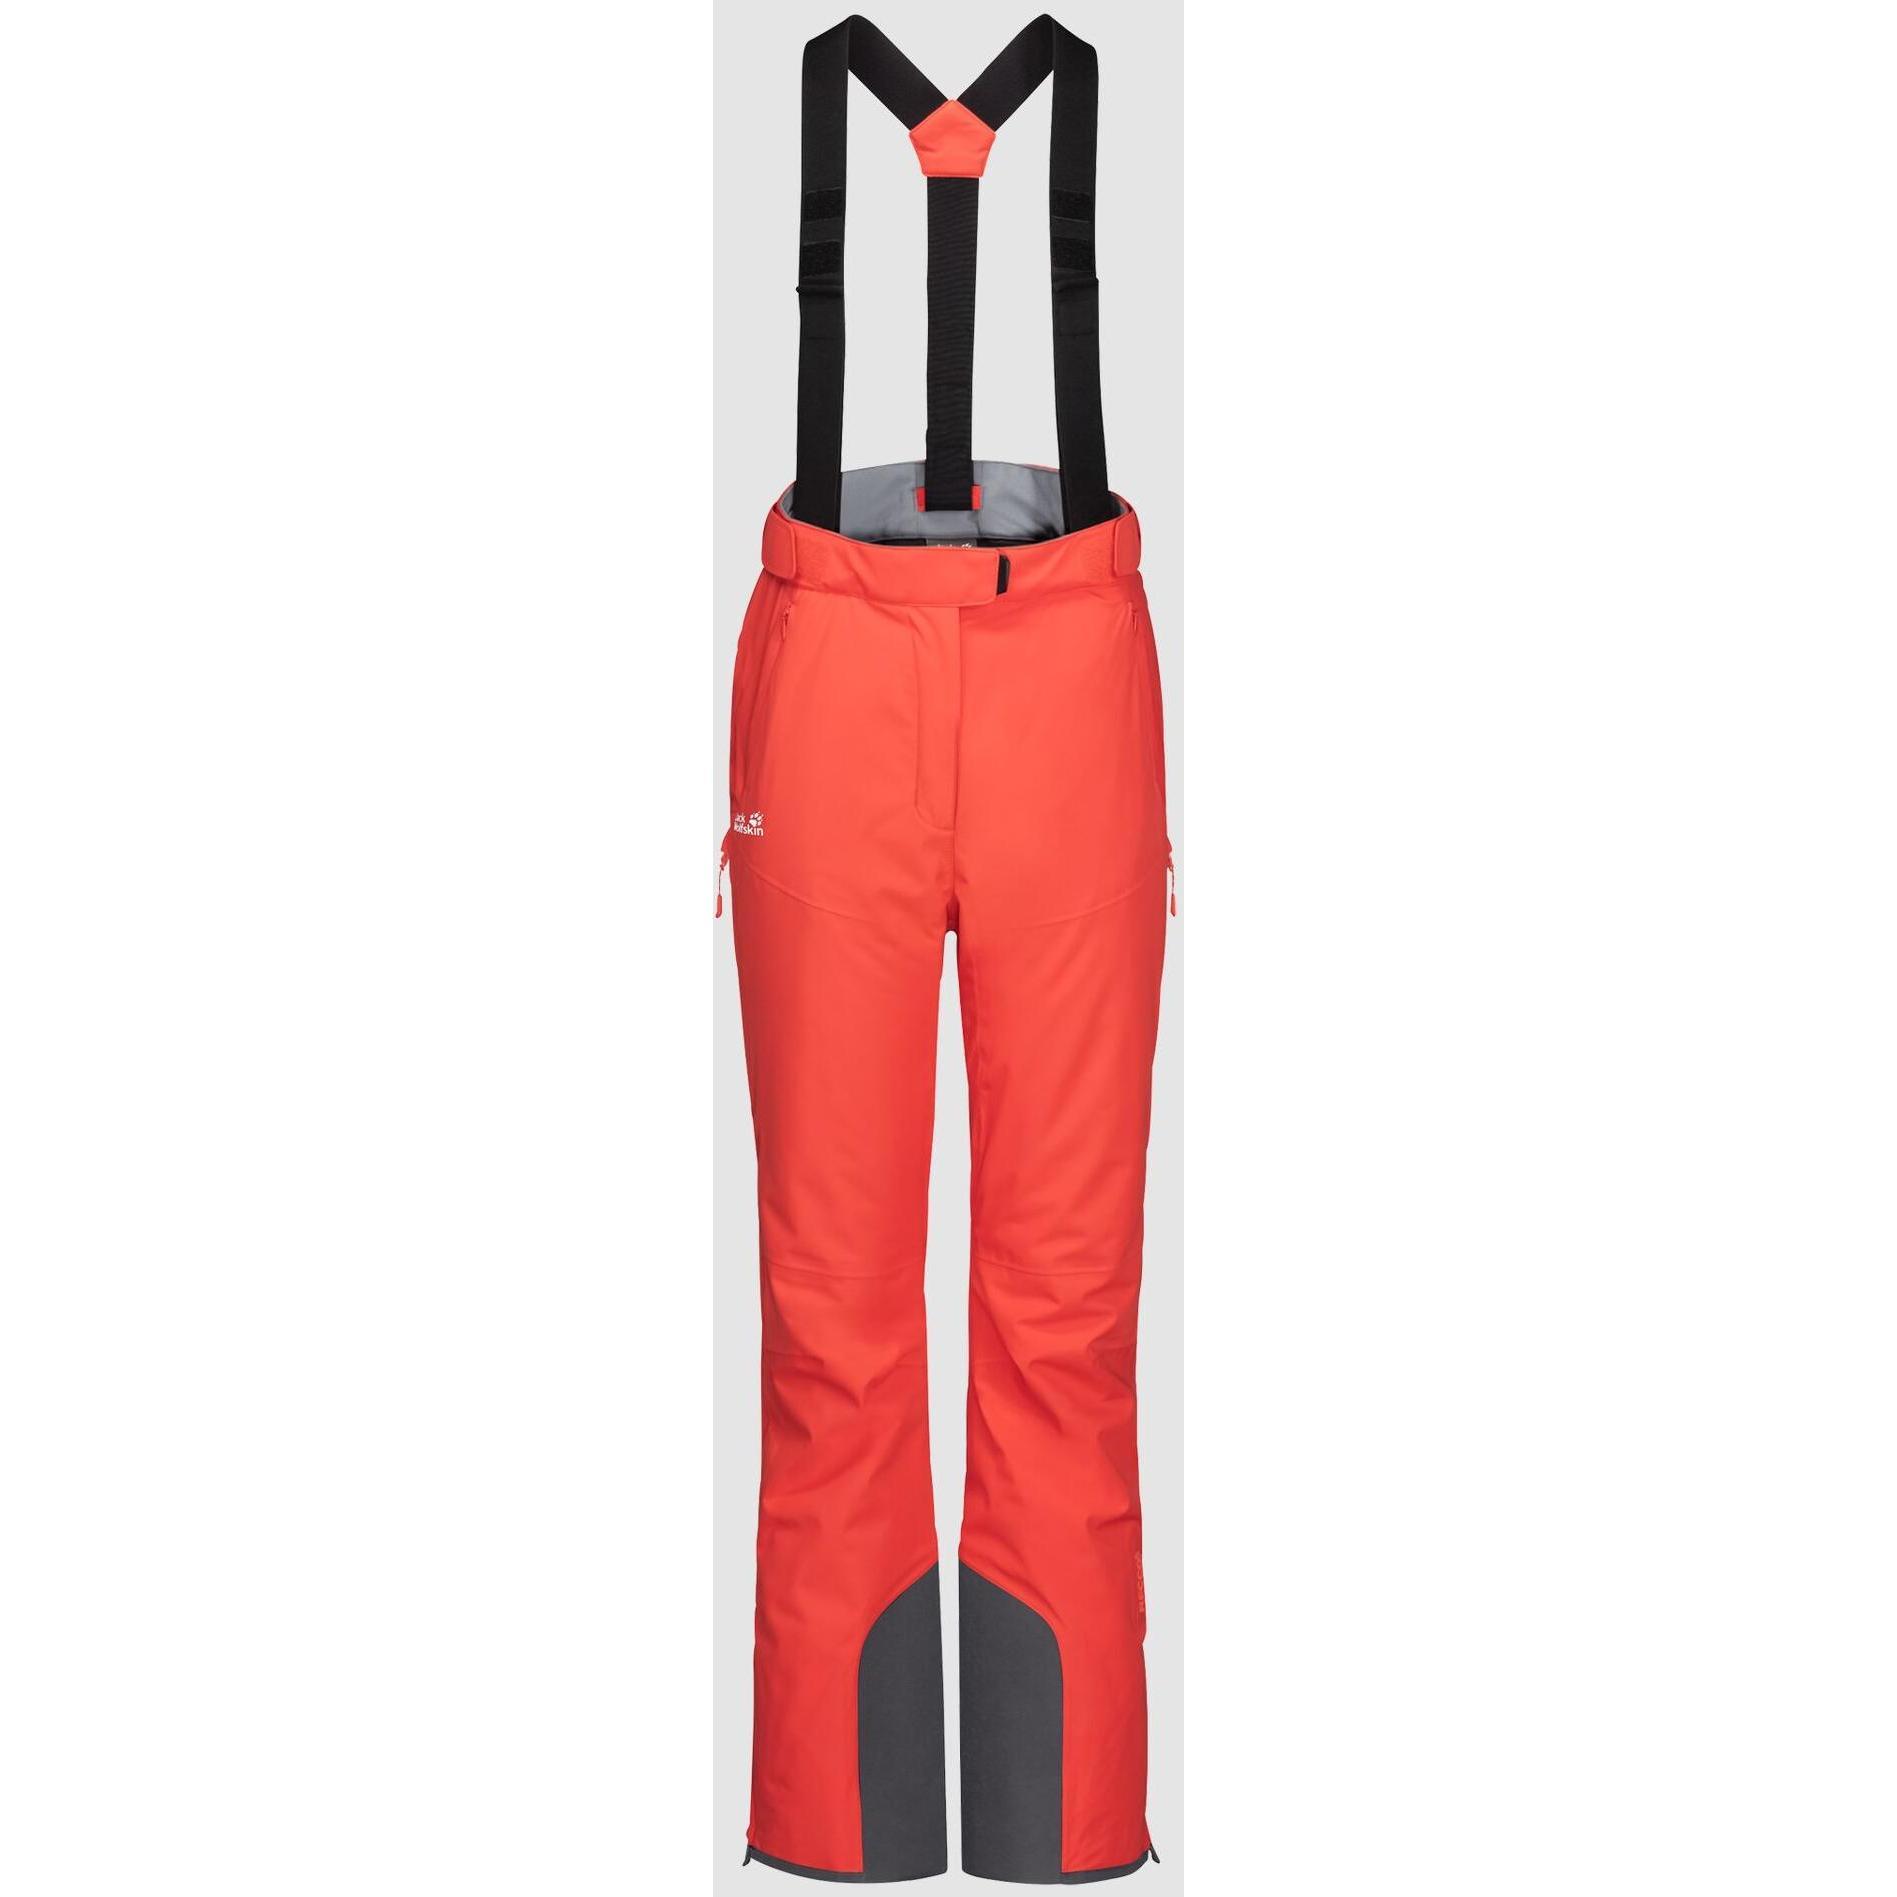 Спортивные брюки Jack Wolfskin Big White Pants orange coral 38 EU.